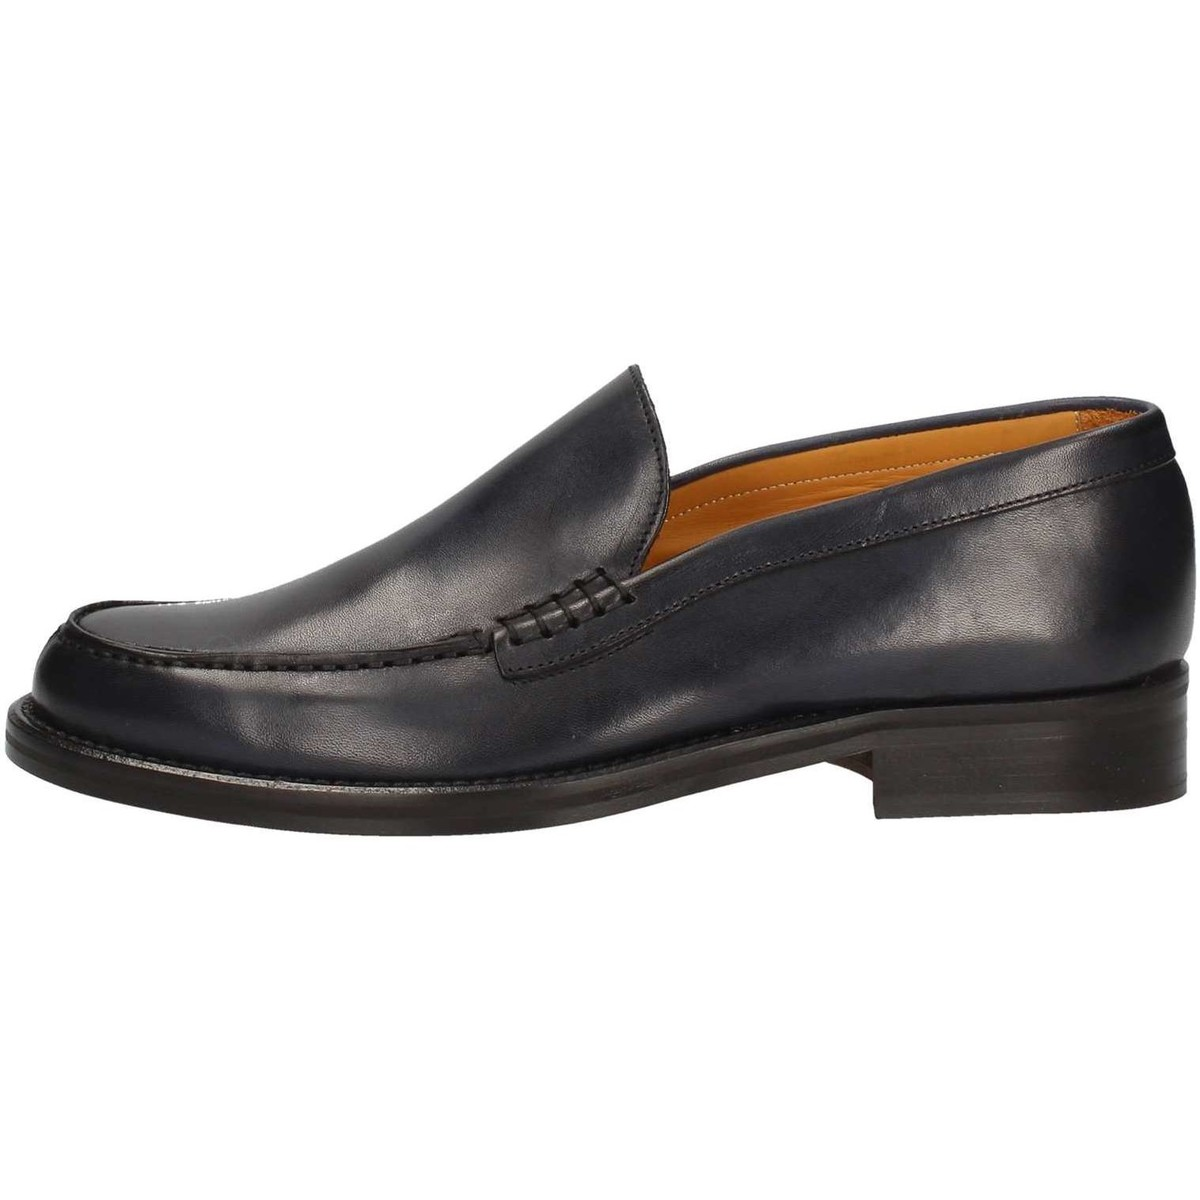 Hudson F06 Mokassin Mann Blau Blau - Schuhe Slipper Herren 112,10 €